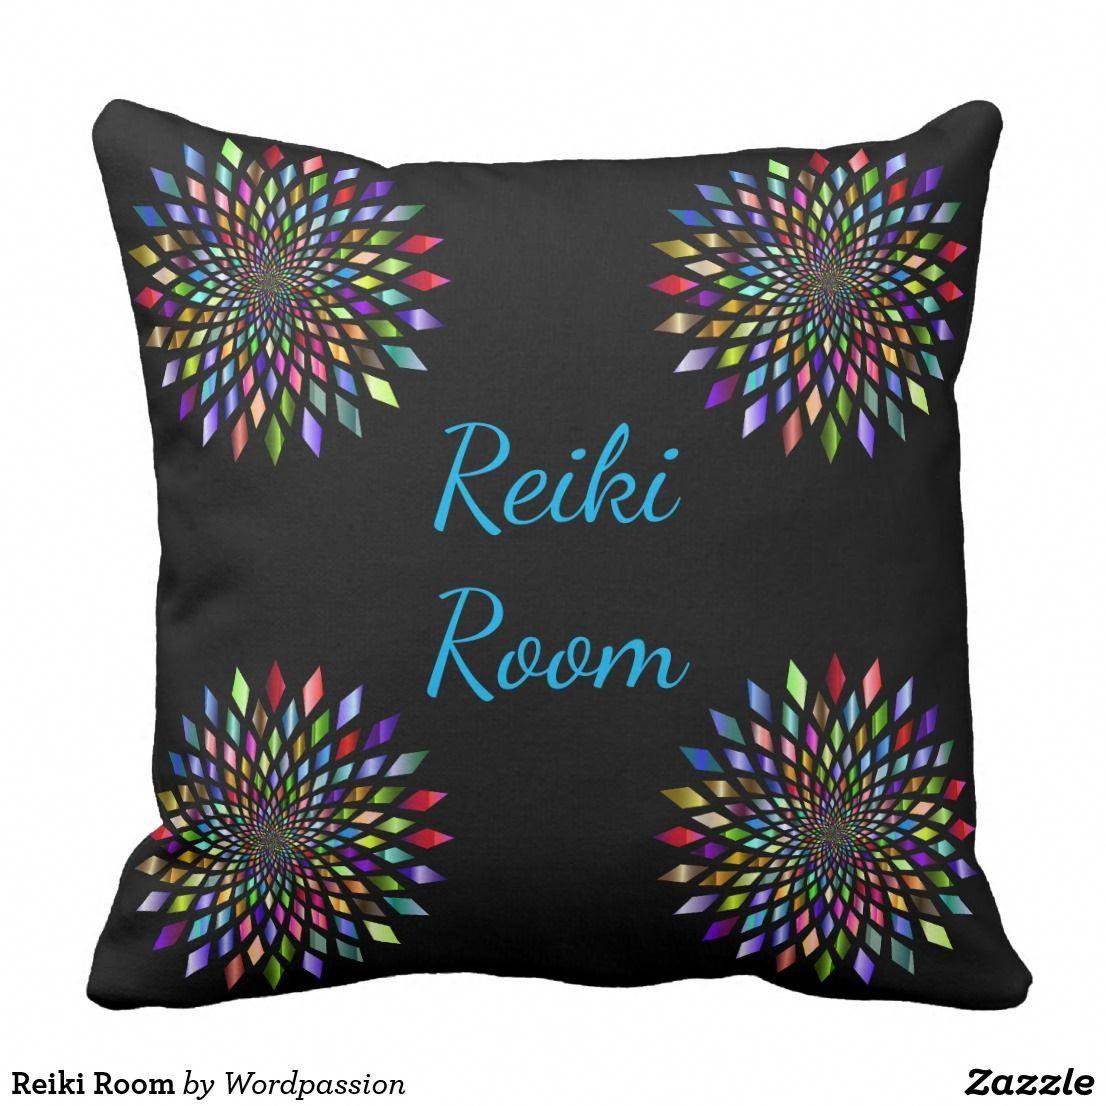 Helpful holistic strategies for reiki classes